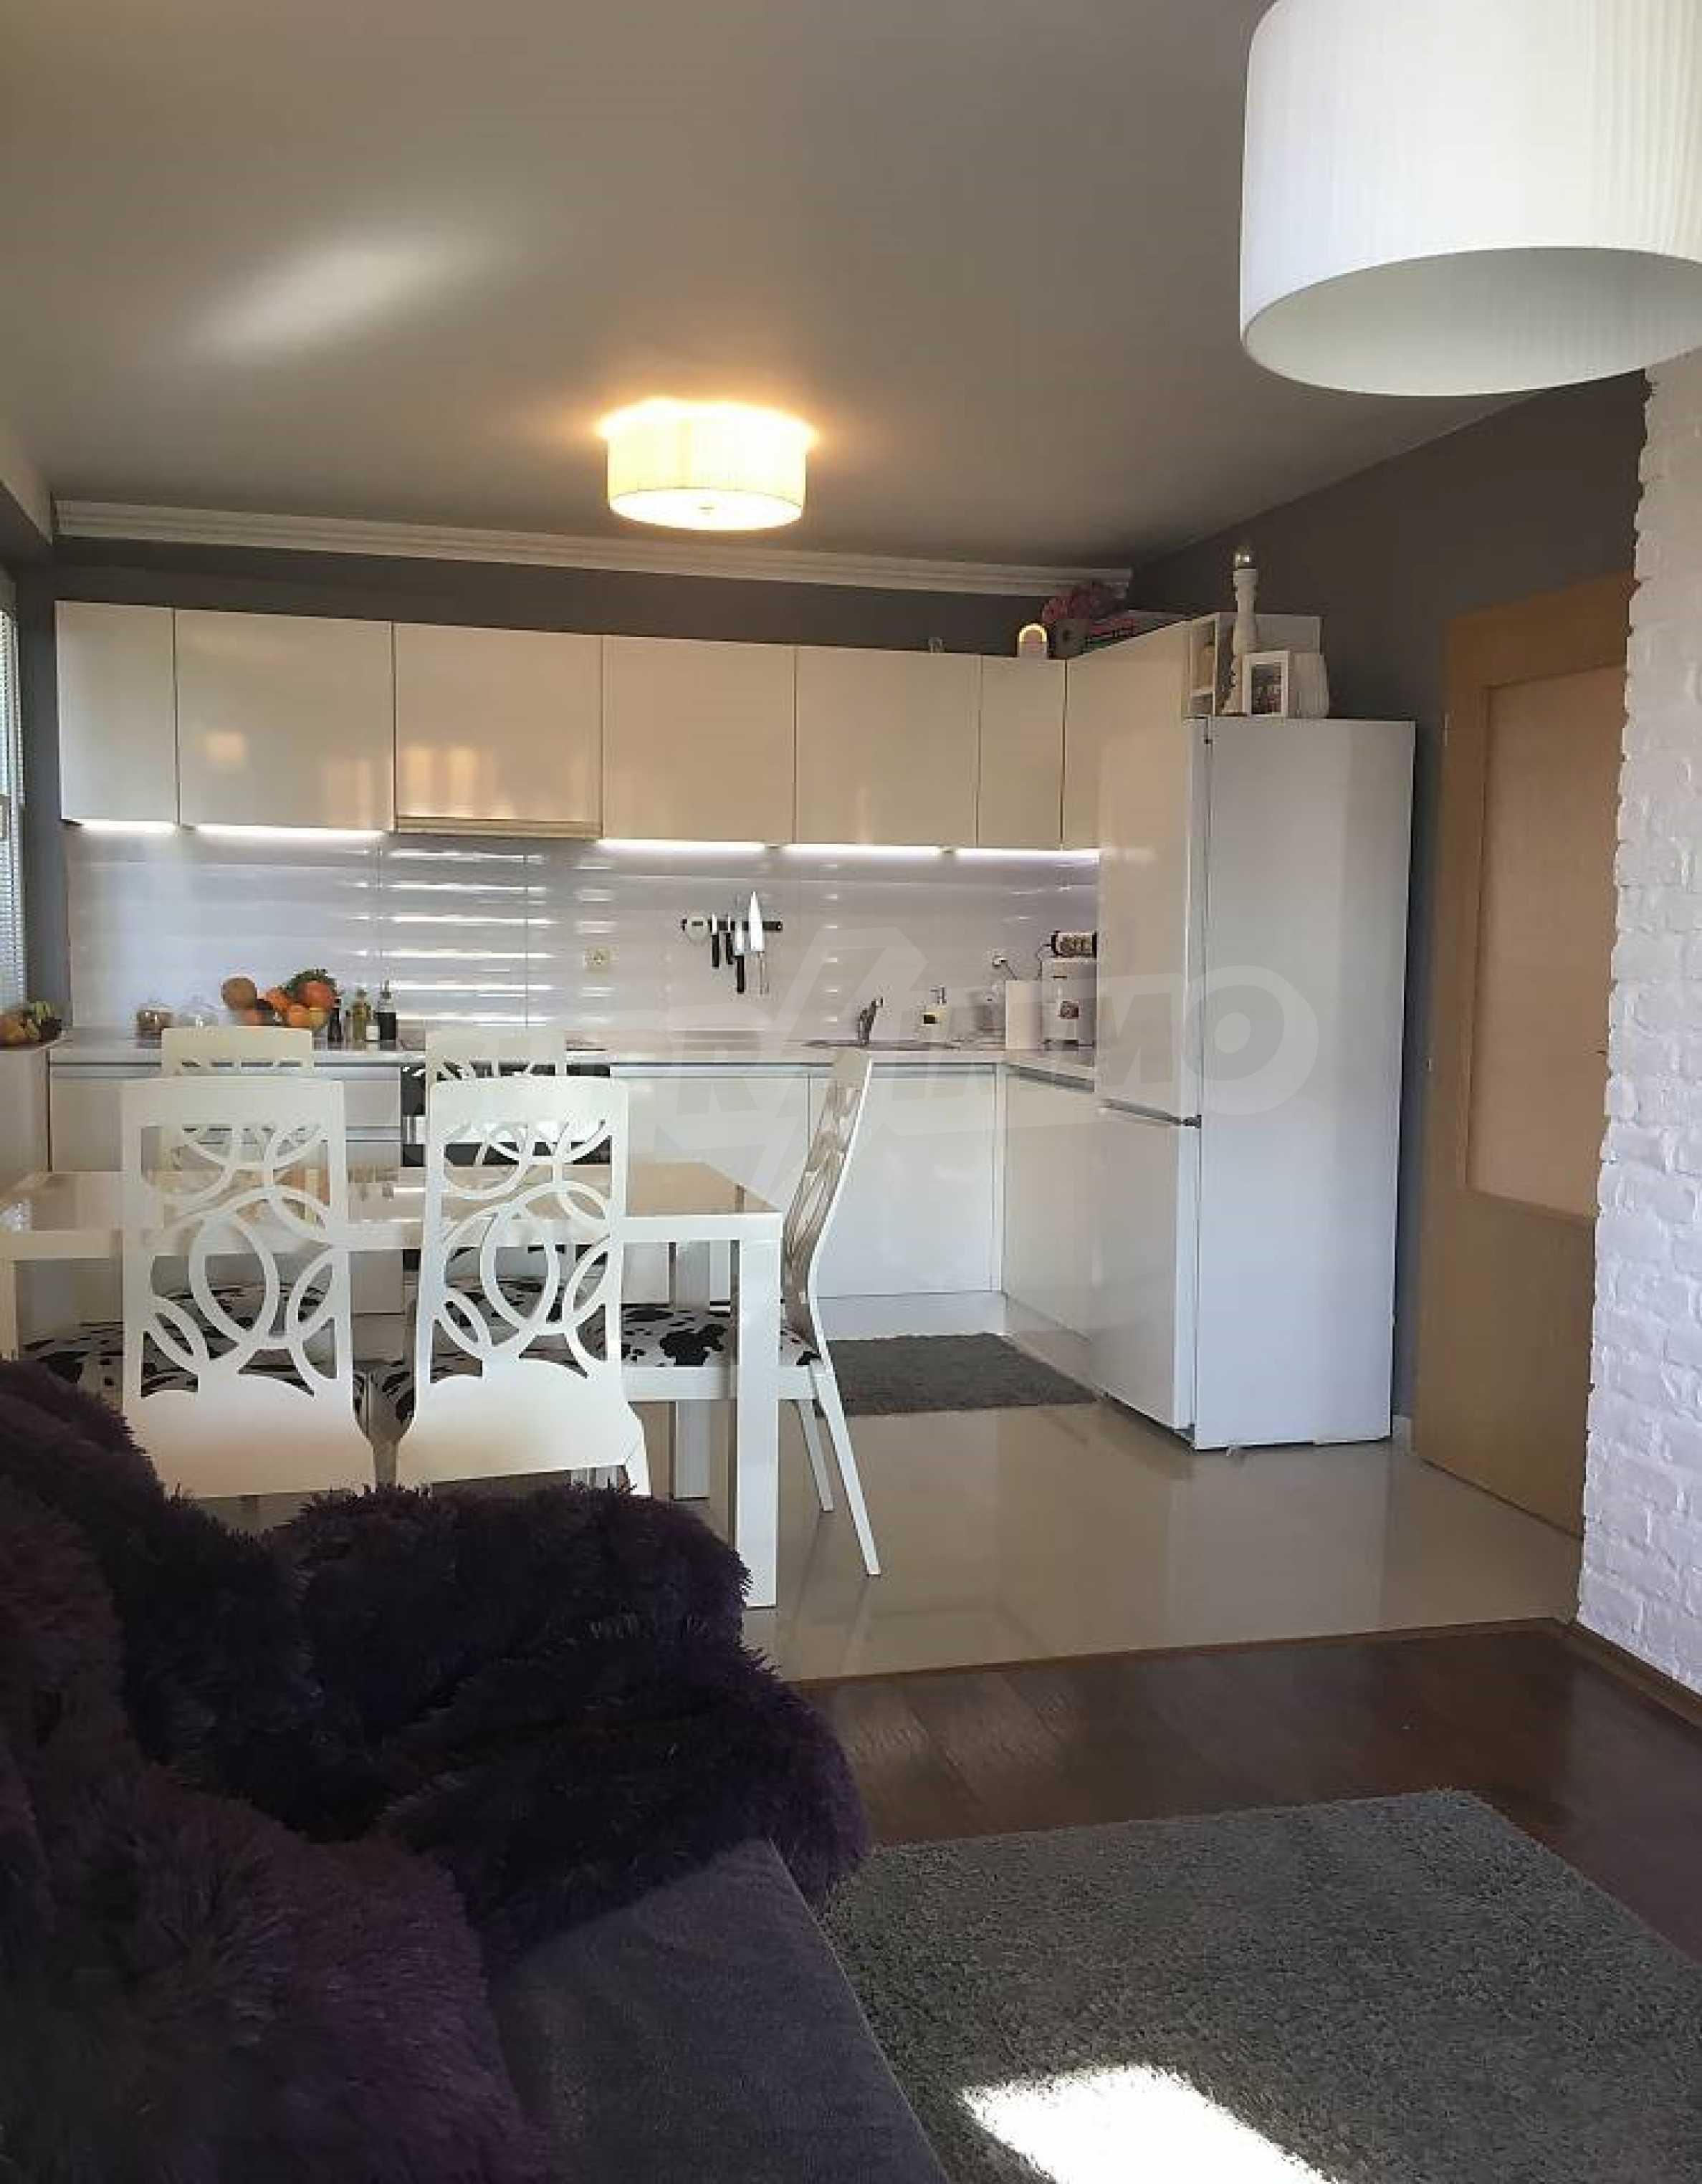 1-bedroom apartment in Burgas 1